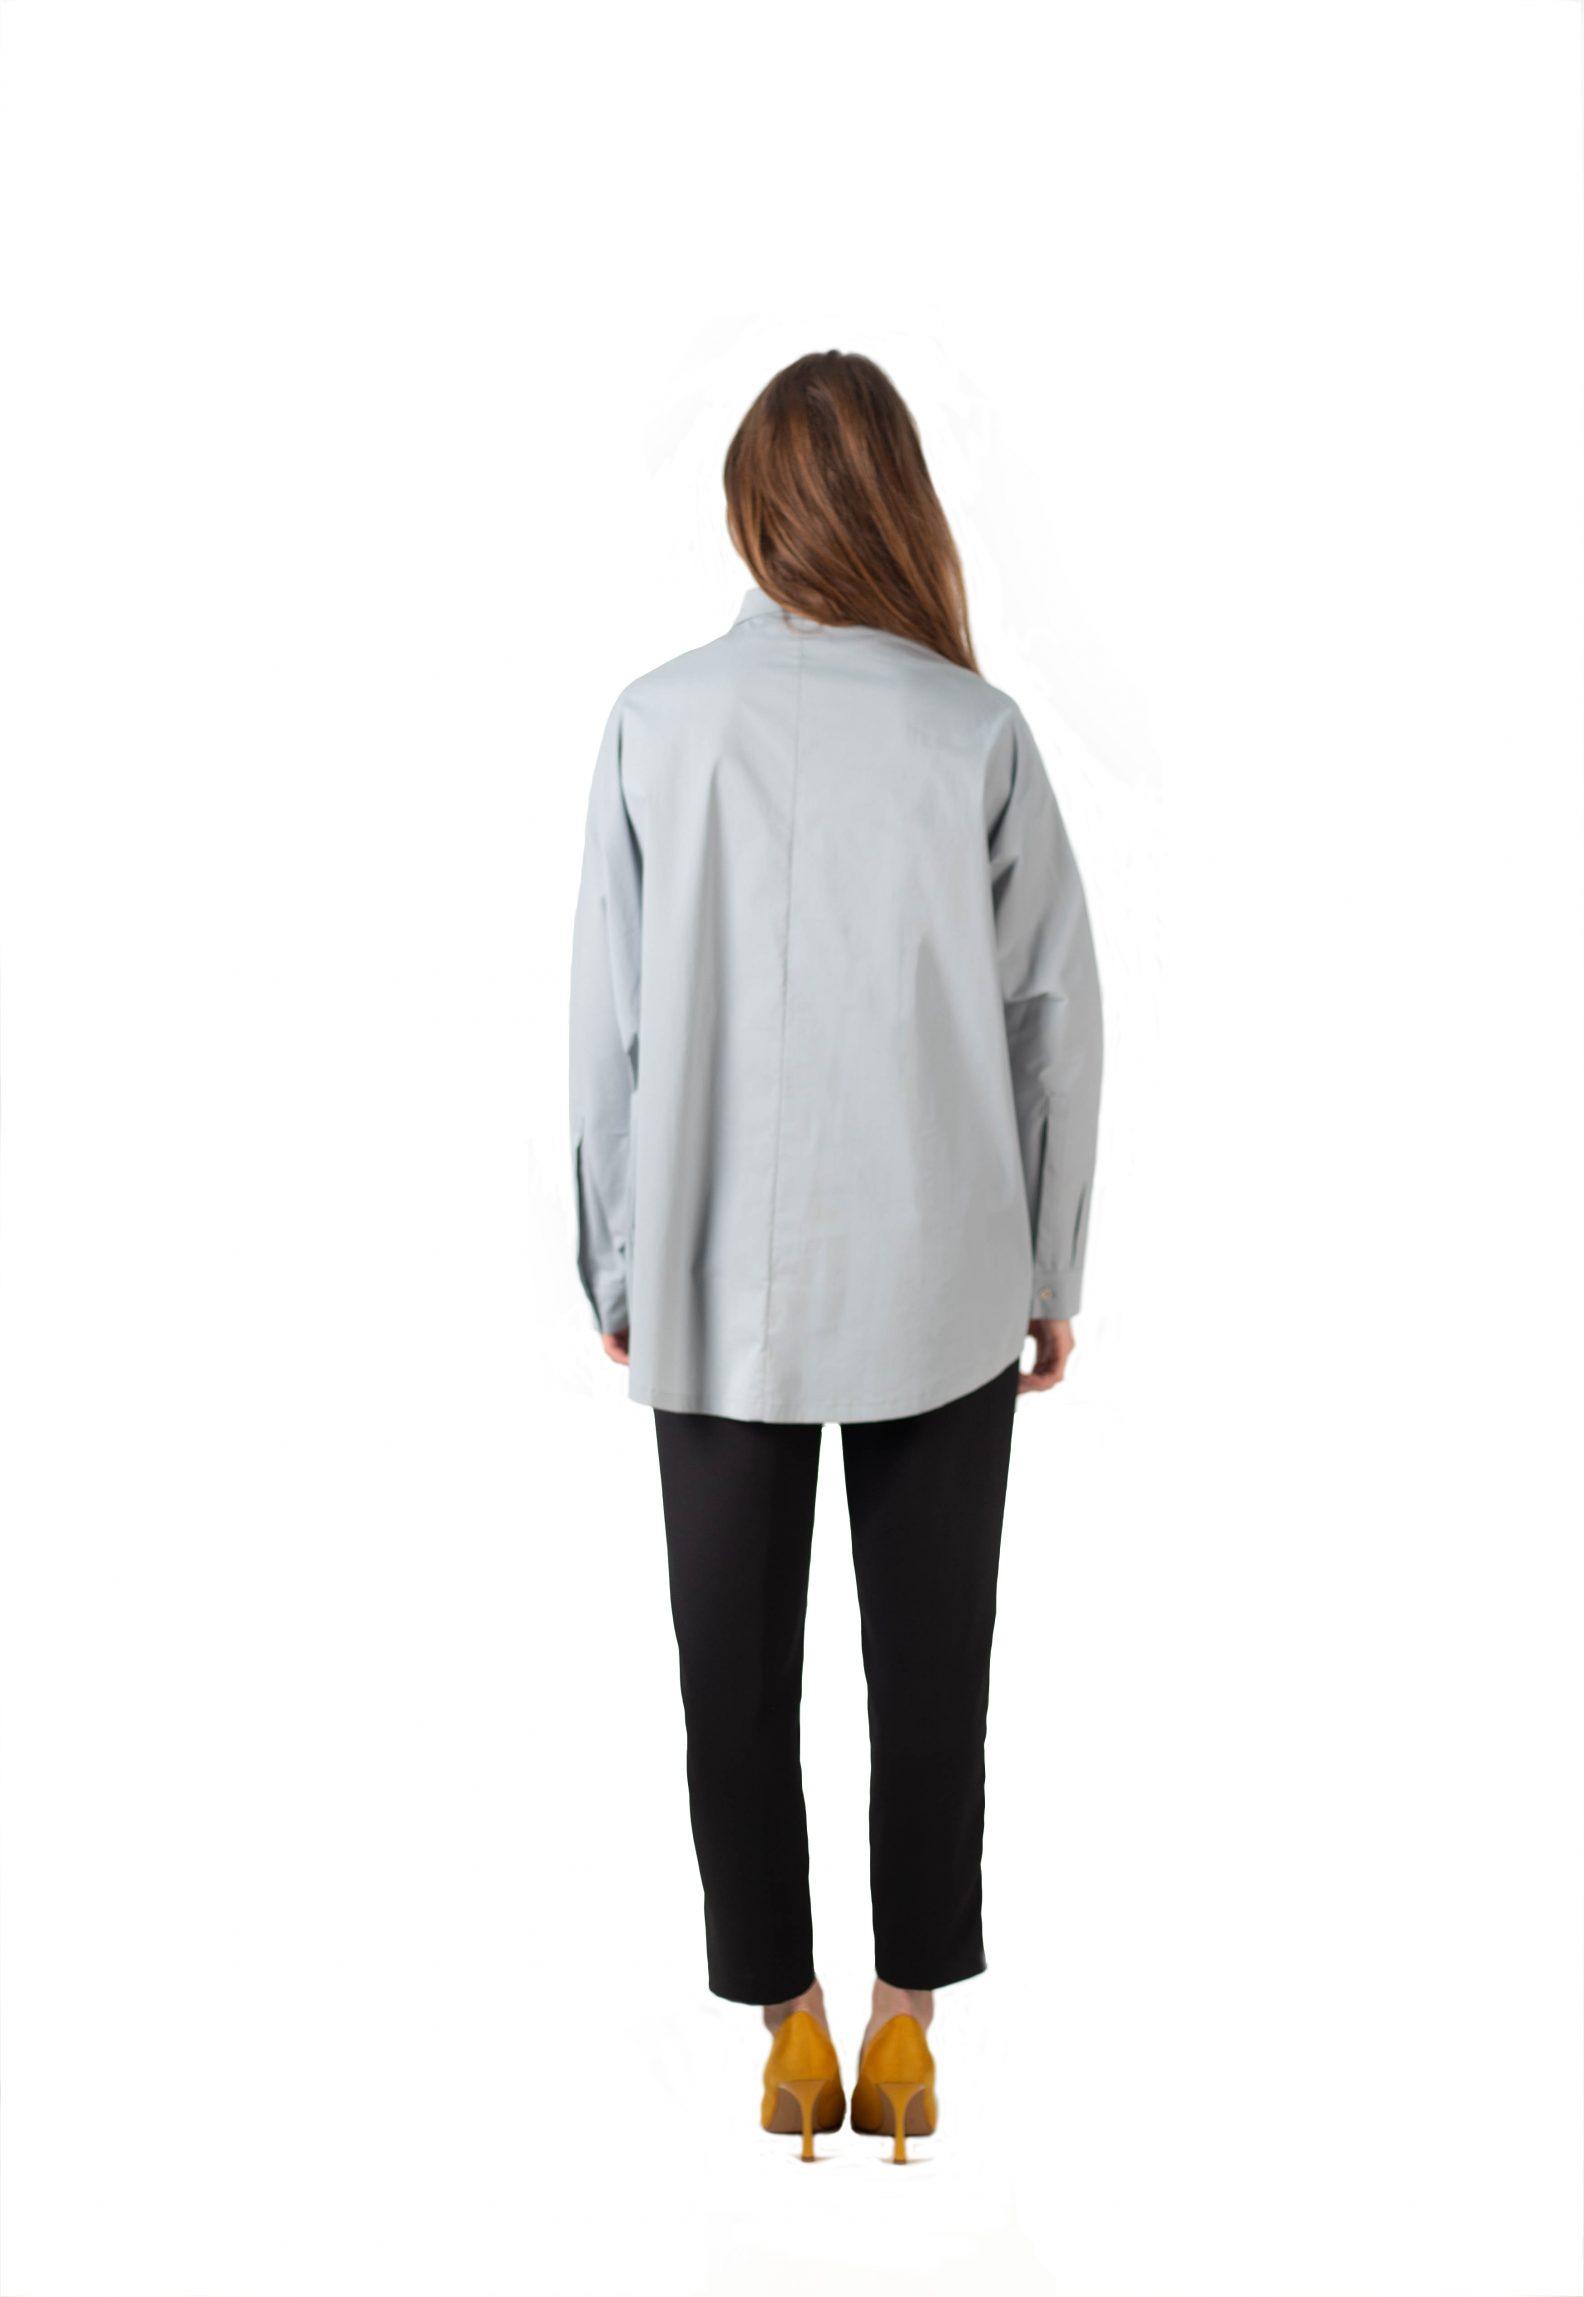 3-chemise-unisexe-affaires-etrangeres-paris-kpop-besides-kimchi